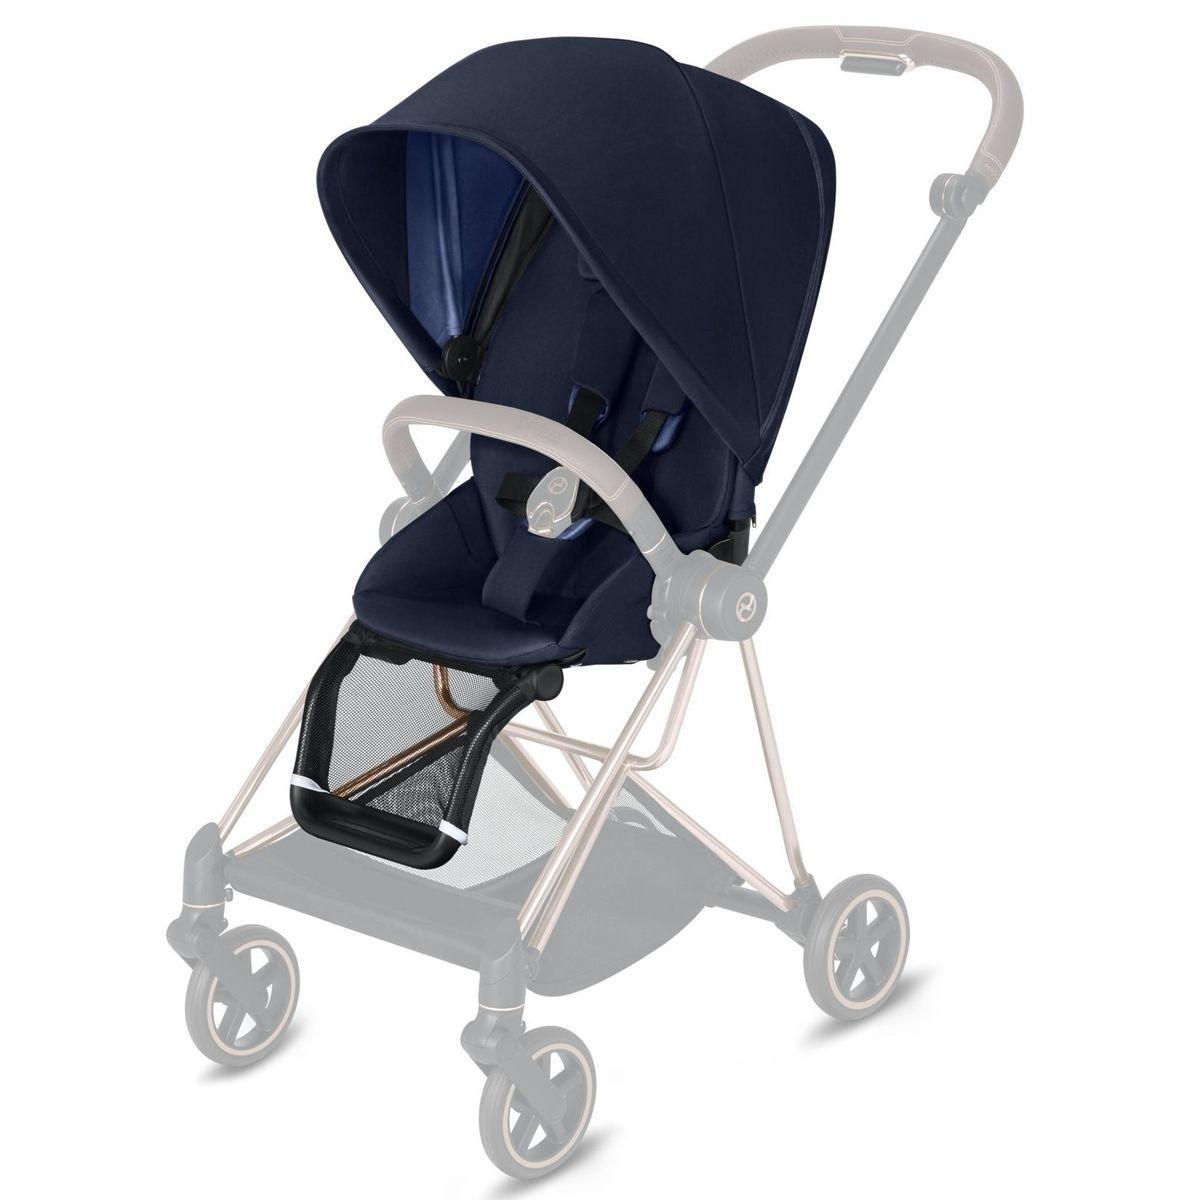 Seat Pack MIOS Cybex Indigo Blue